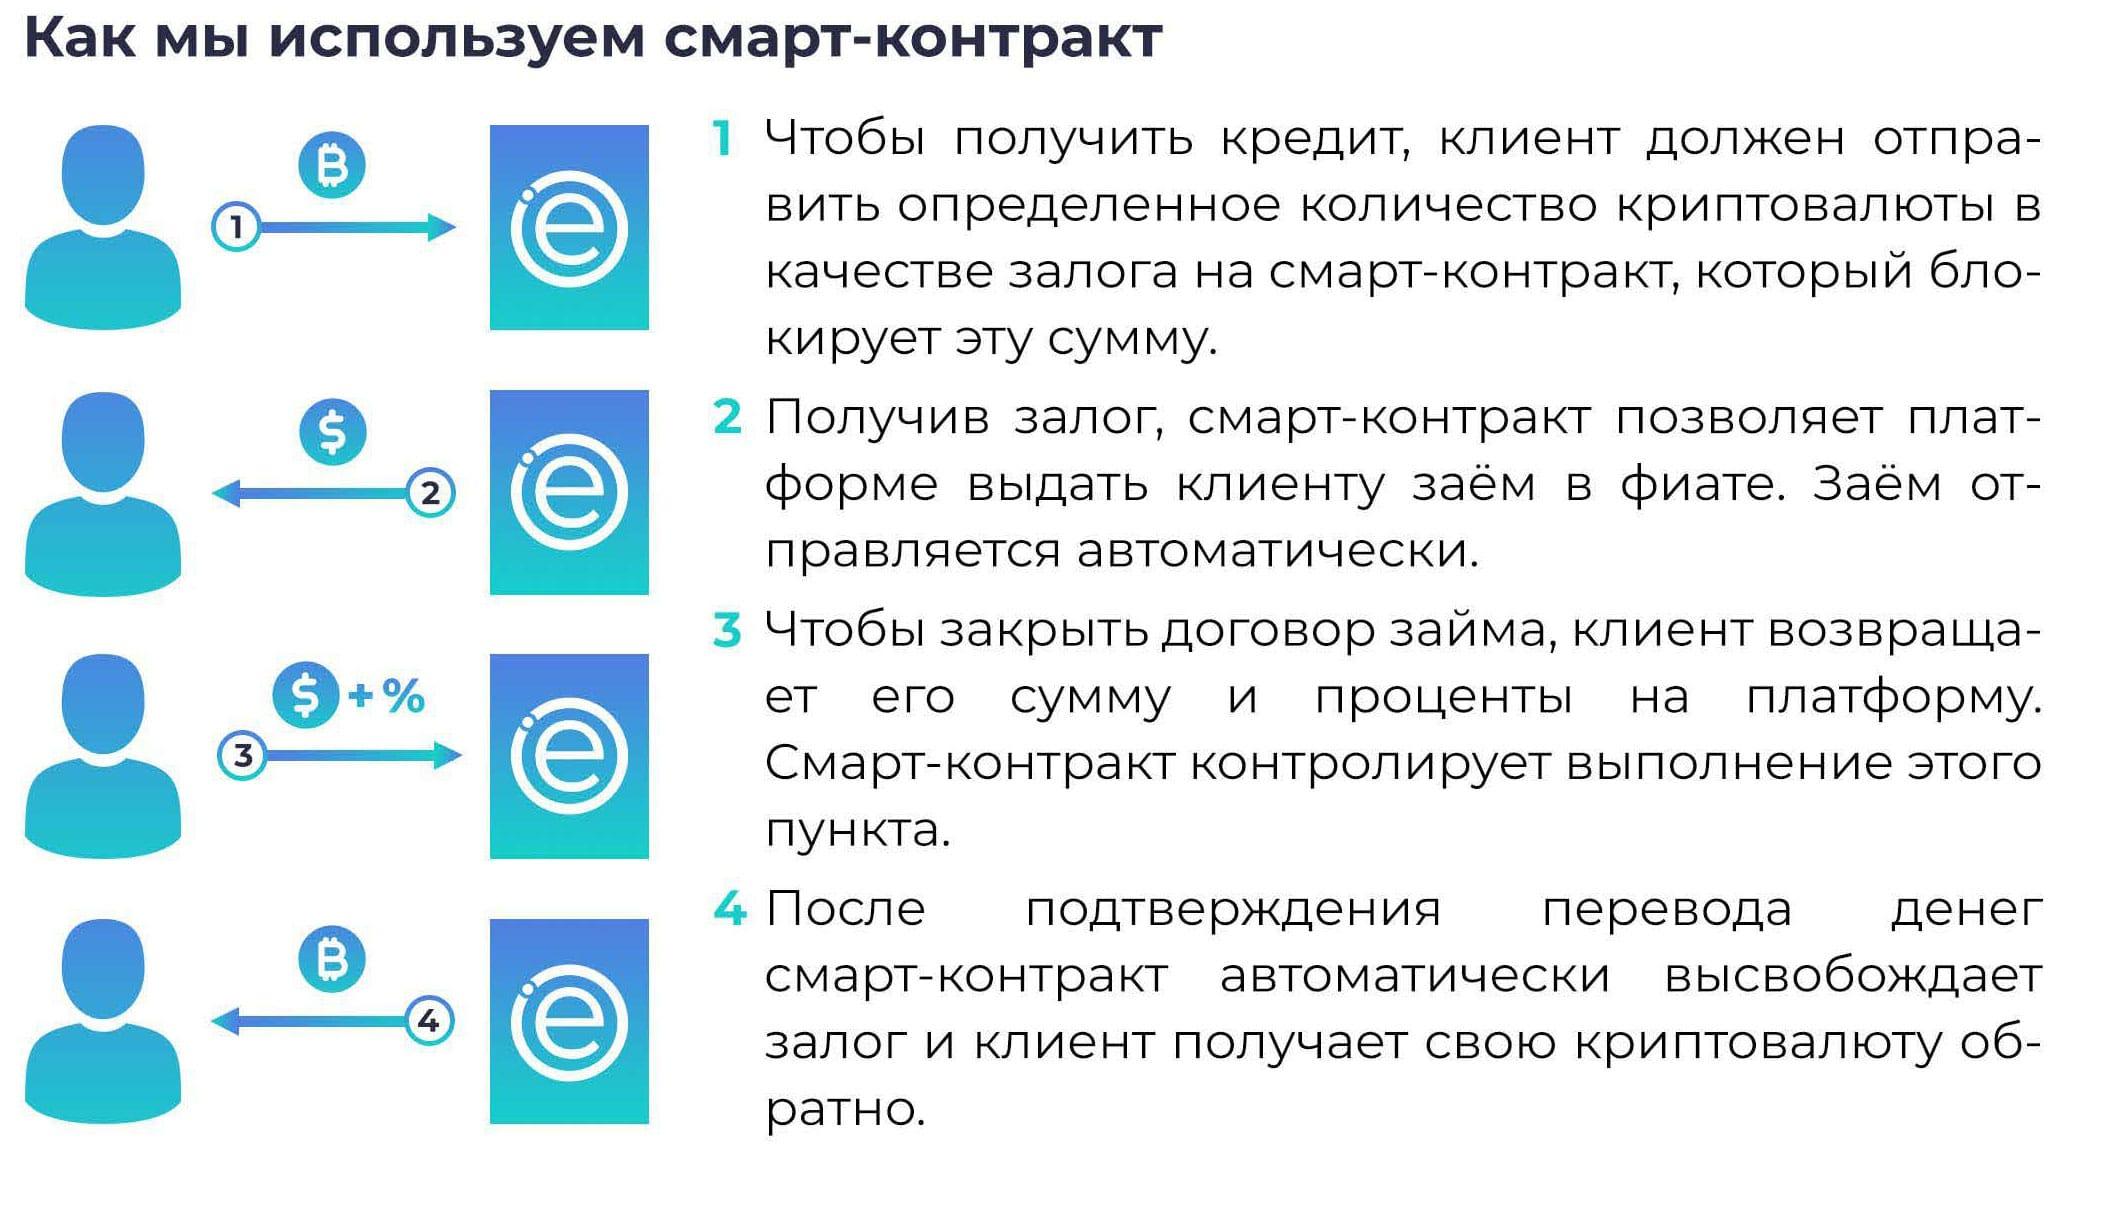 eCoinomic - кредиты под залог криптовалюты